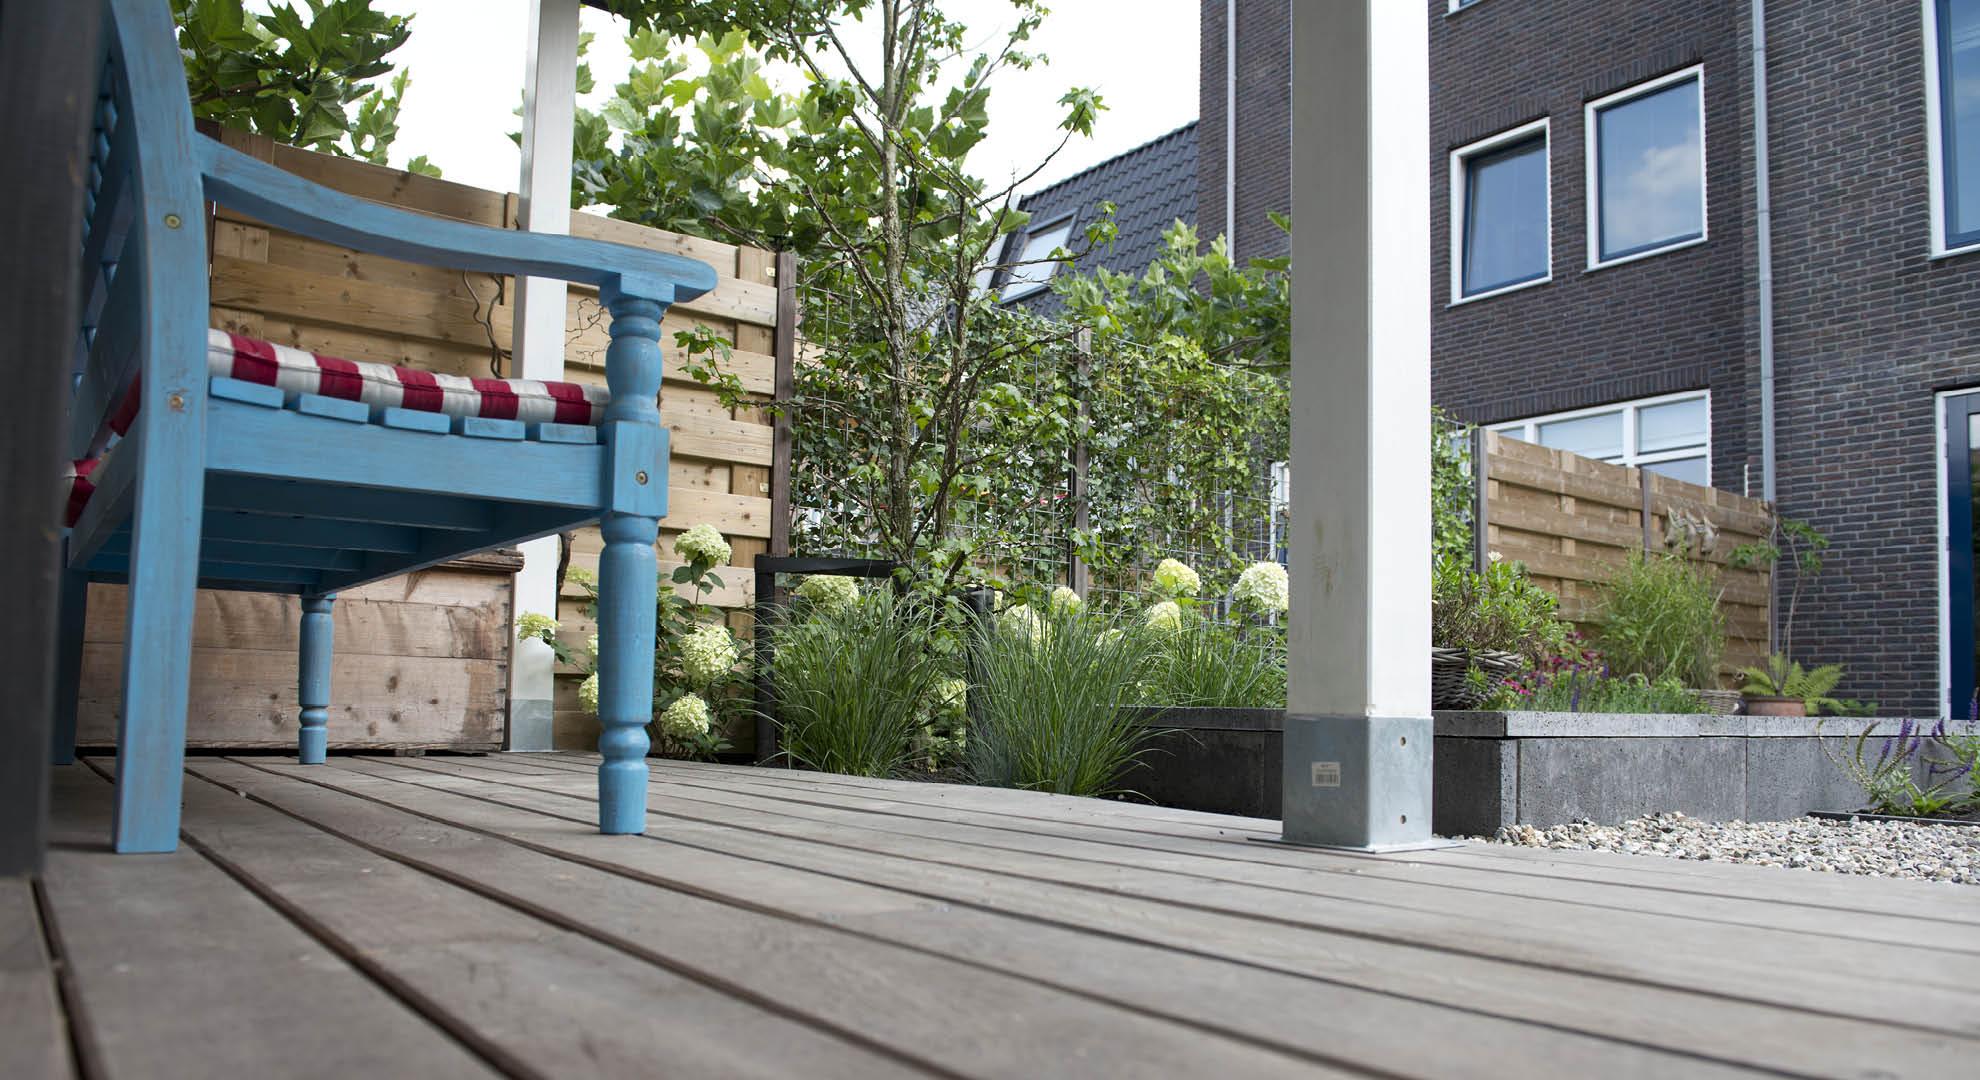 Moderne achtertuin bij nieuwbouwwoning - Foto 6